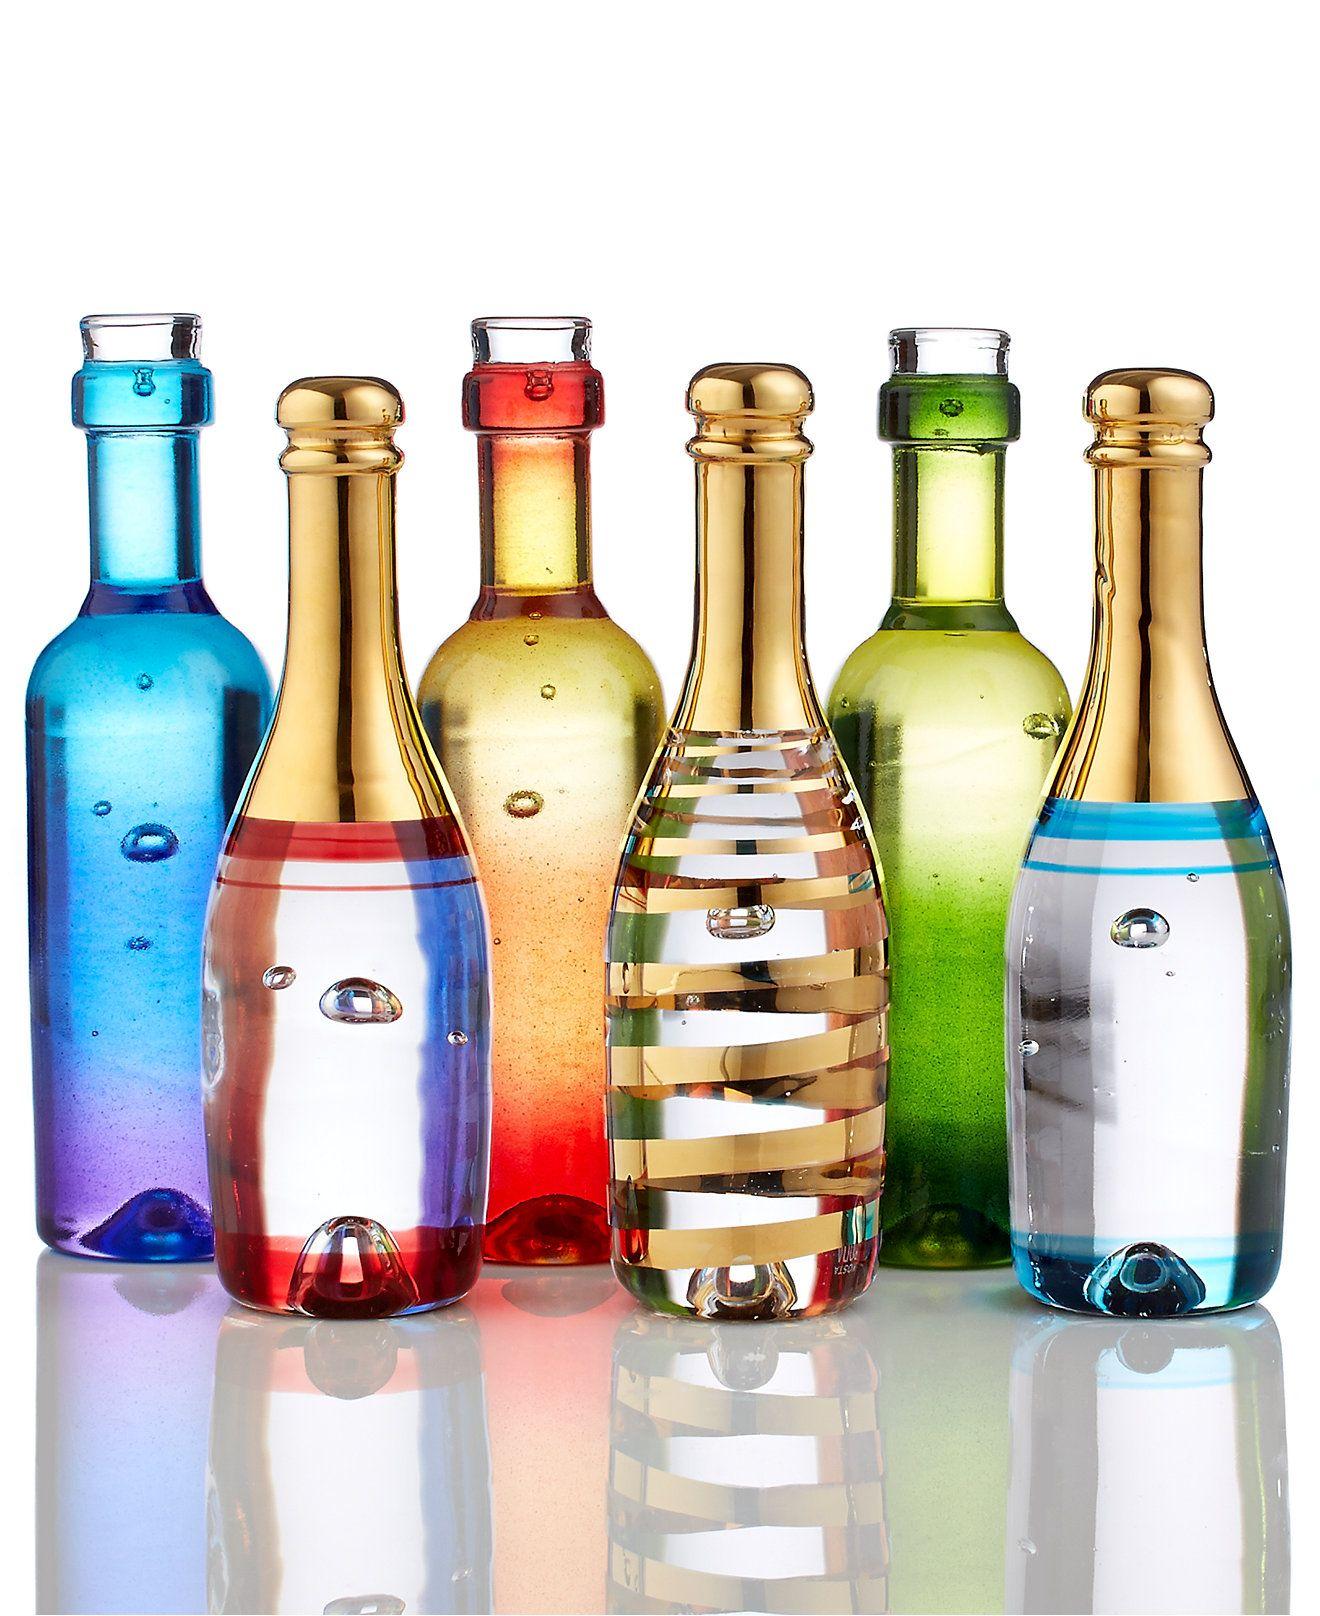 Kosta Boda Celebrate Champagne And Wine Bottles Collection Home Decor For The Home Macy S Bottle Wine Bottle Kosta Boda